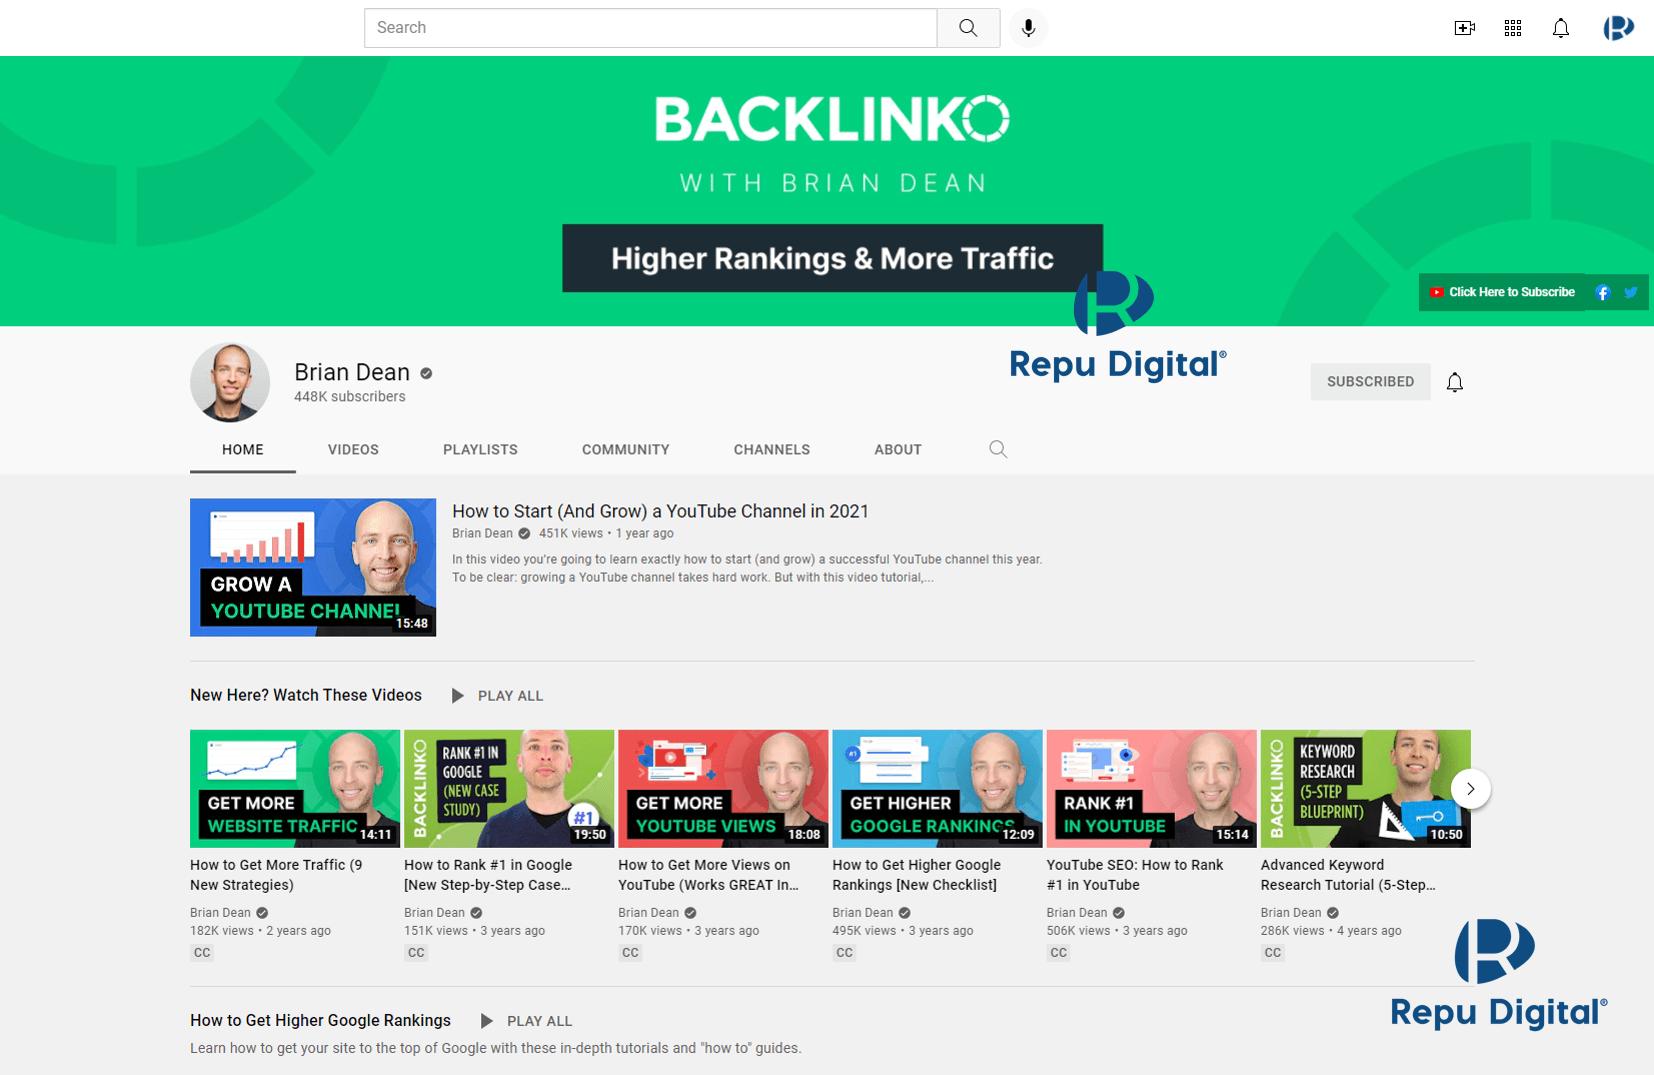 Brian Dean & Backlino - kênh YouTube học Digital Marketing miễn phí